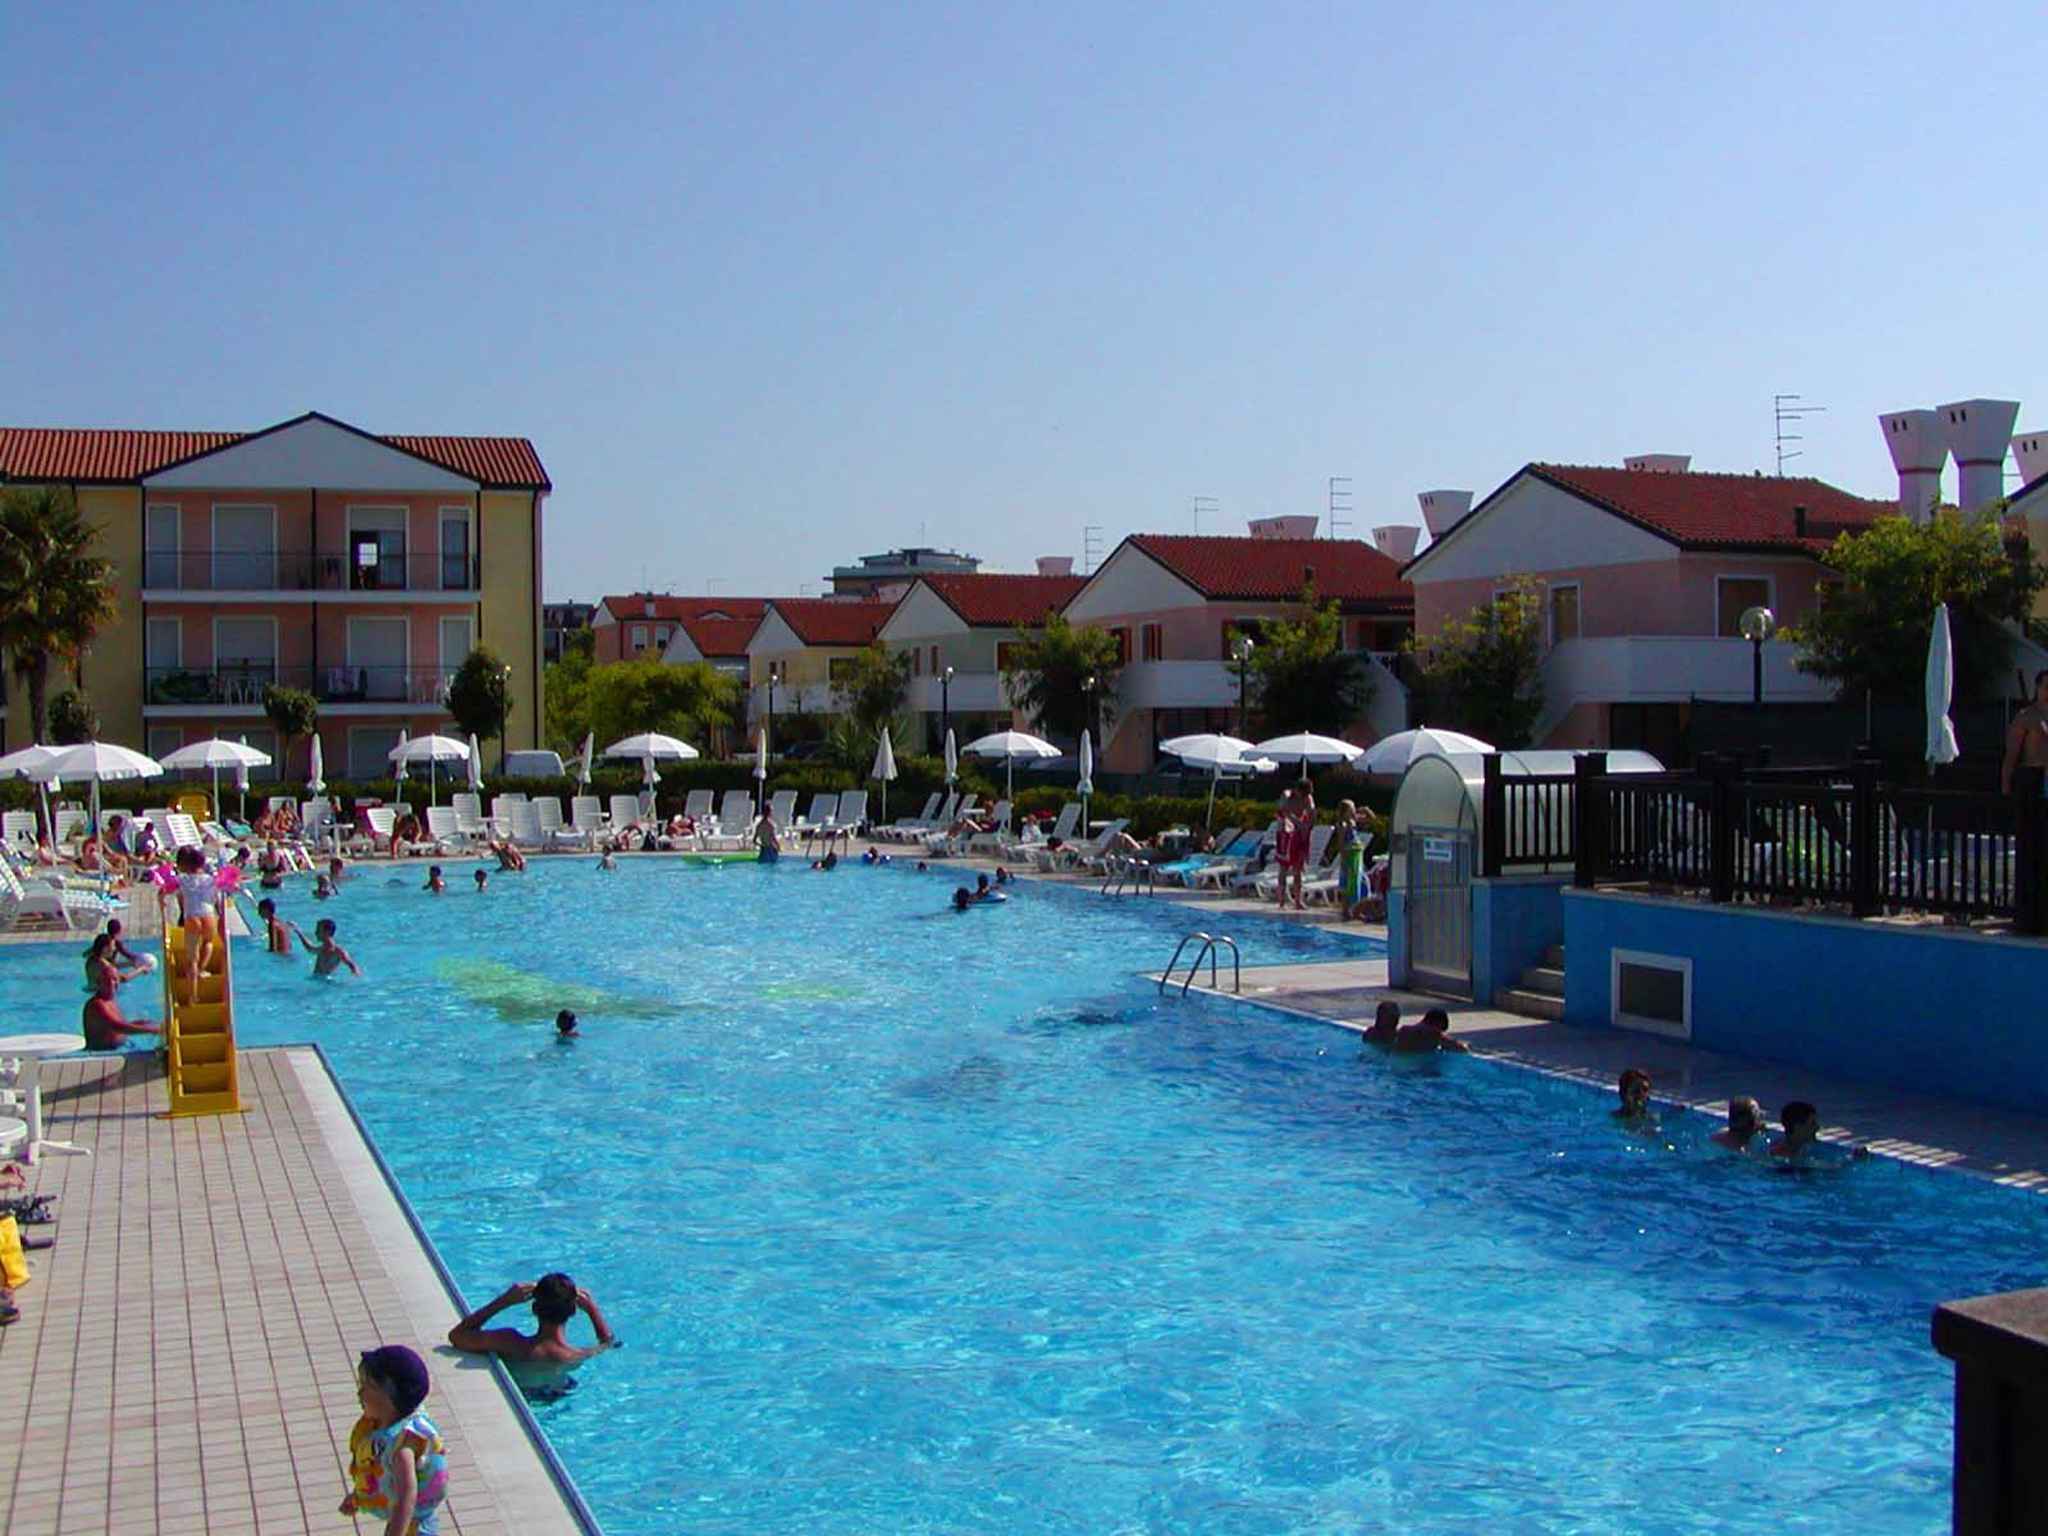 Ferienhaus mit Pool und Grill (284304), Rosolina Mare, Rovigo, Venetien, Italien, Bild 13